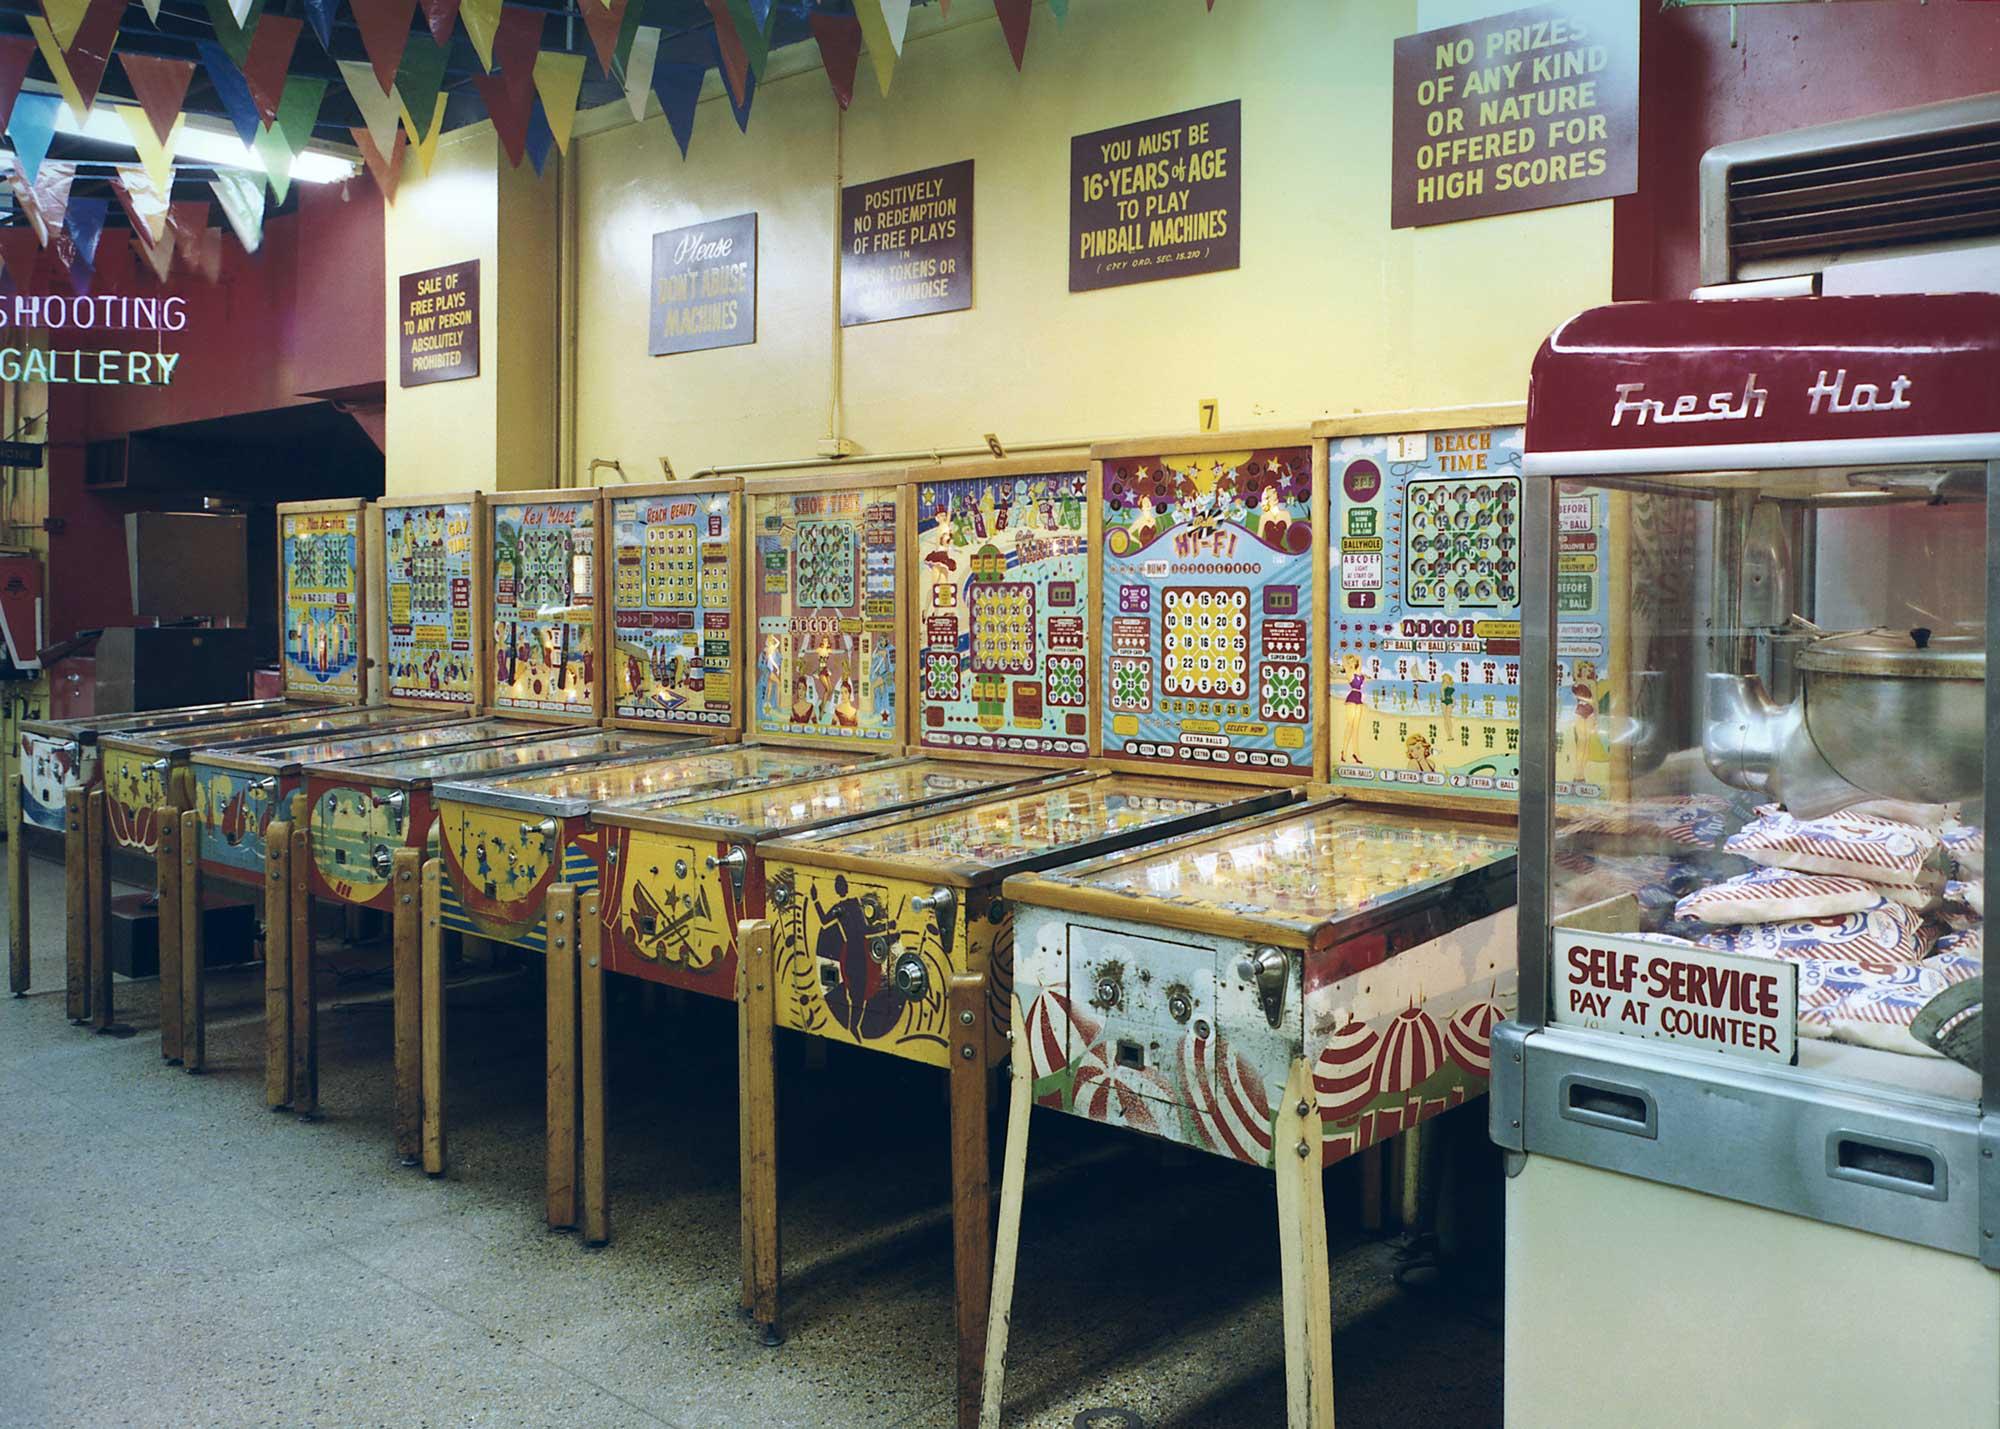 wonderland-arcade-8.jpg